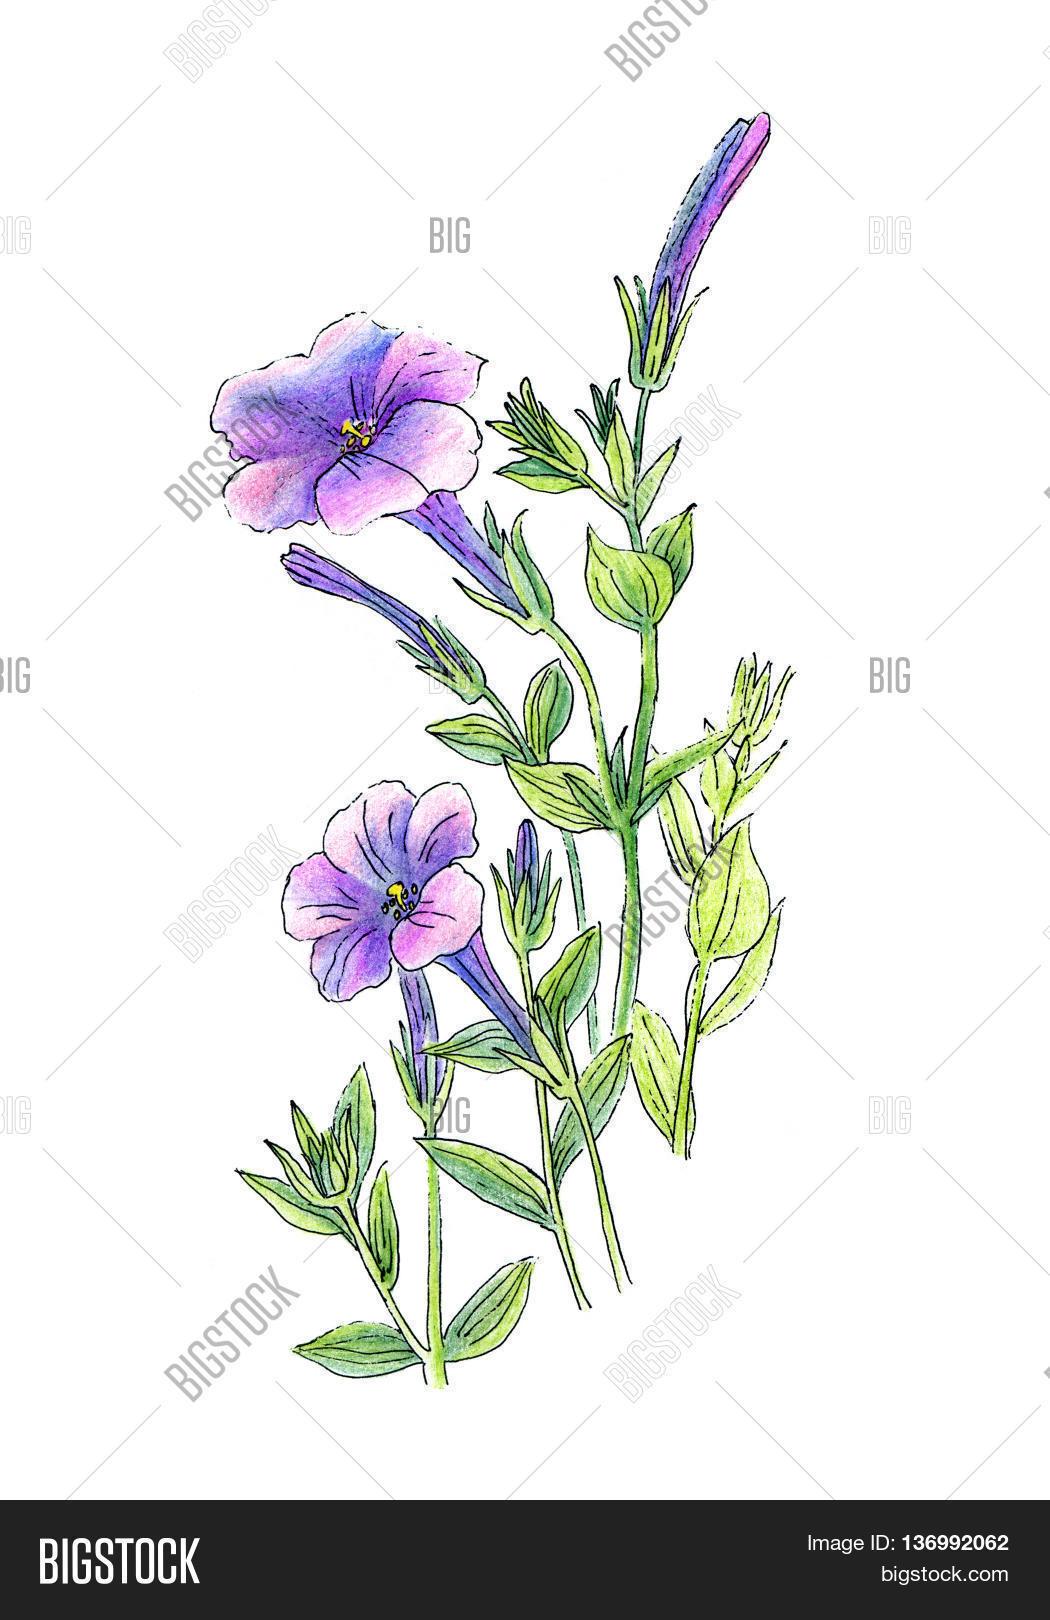 Beautiful Petunia Image & Photo (Free Trial) | Bigstock